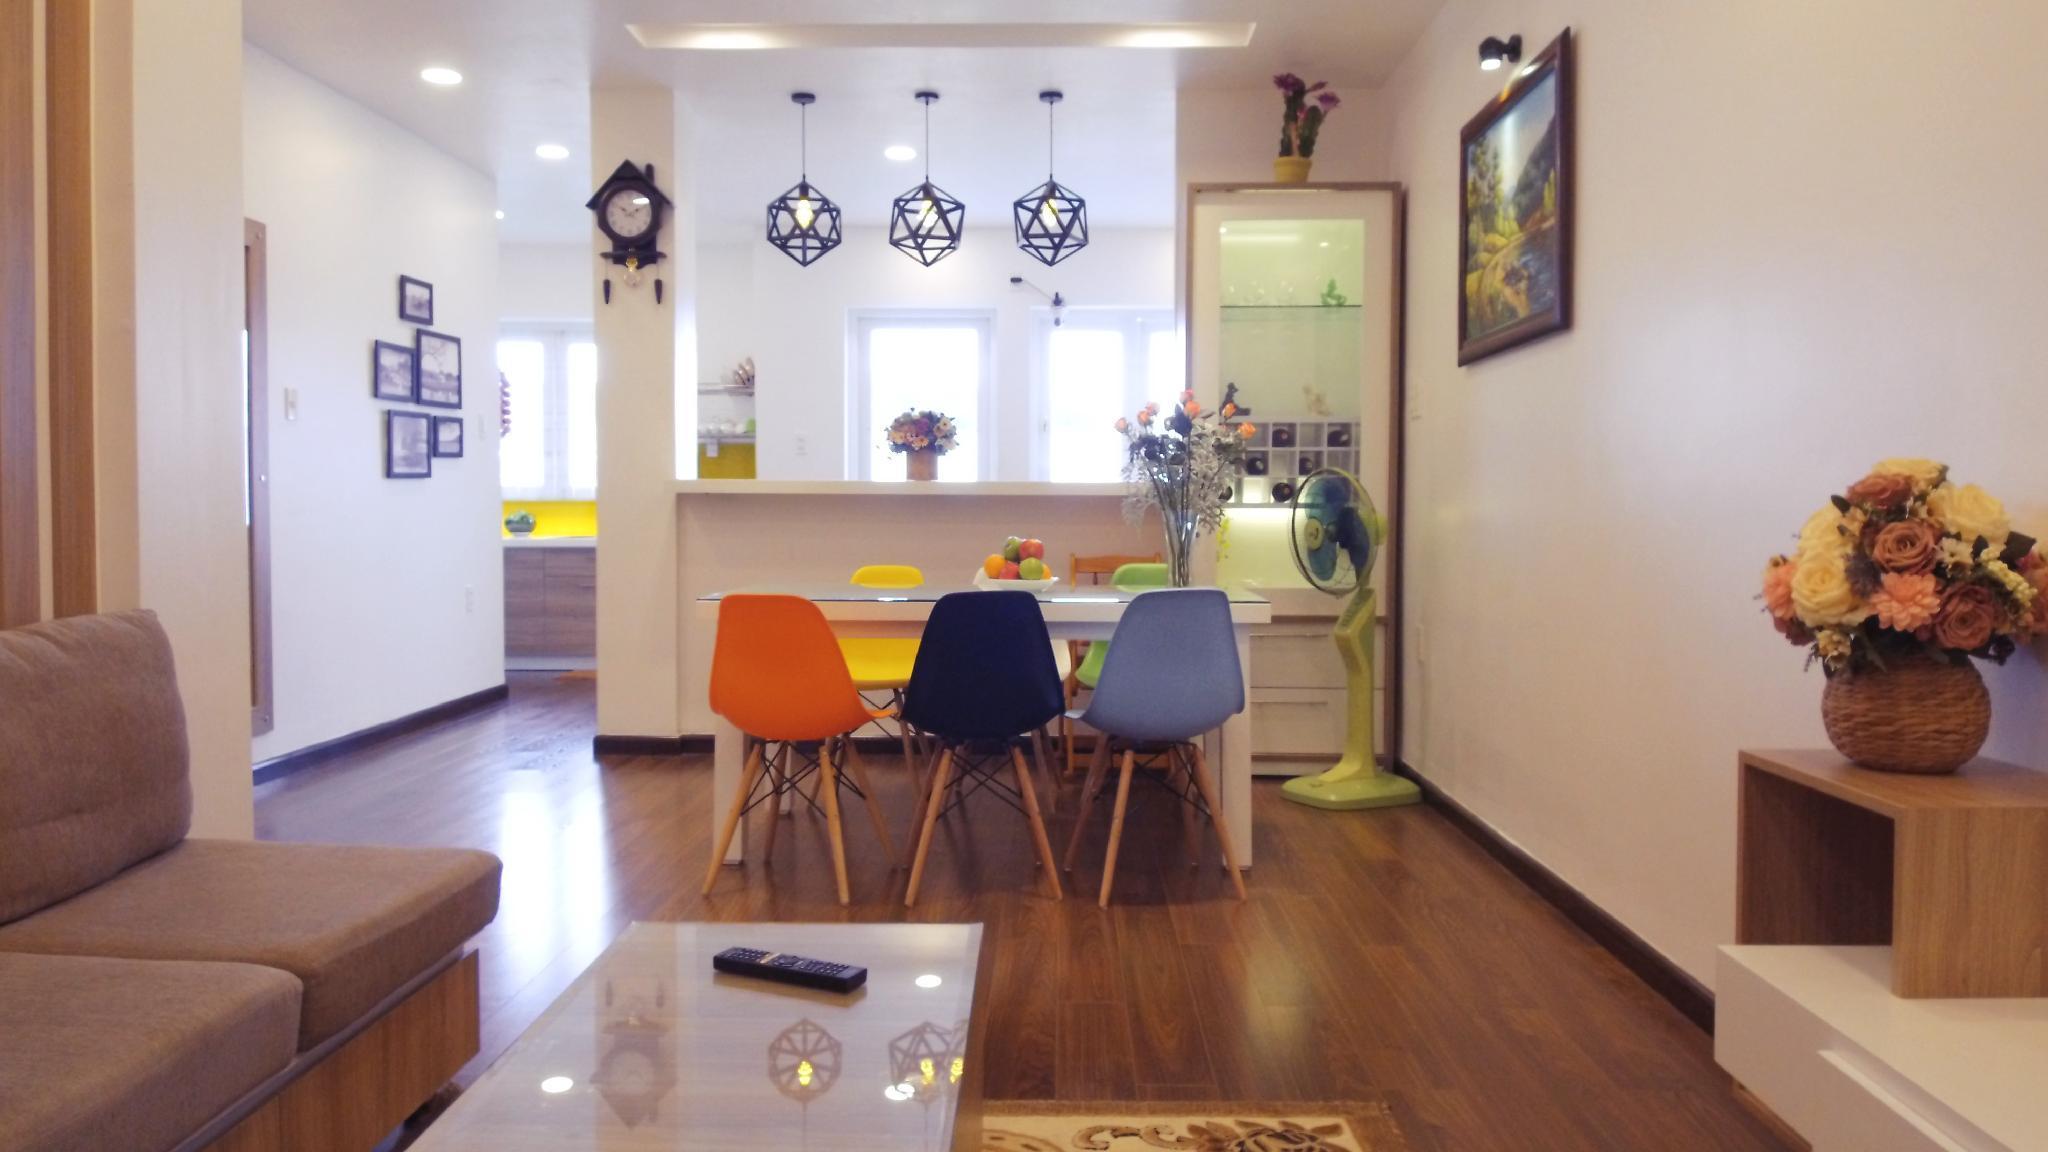 Dalat Cuckoo's Nest Apartment